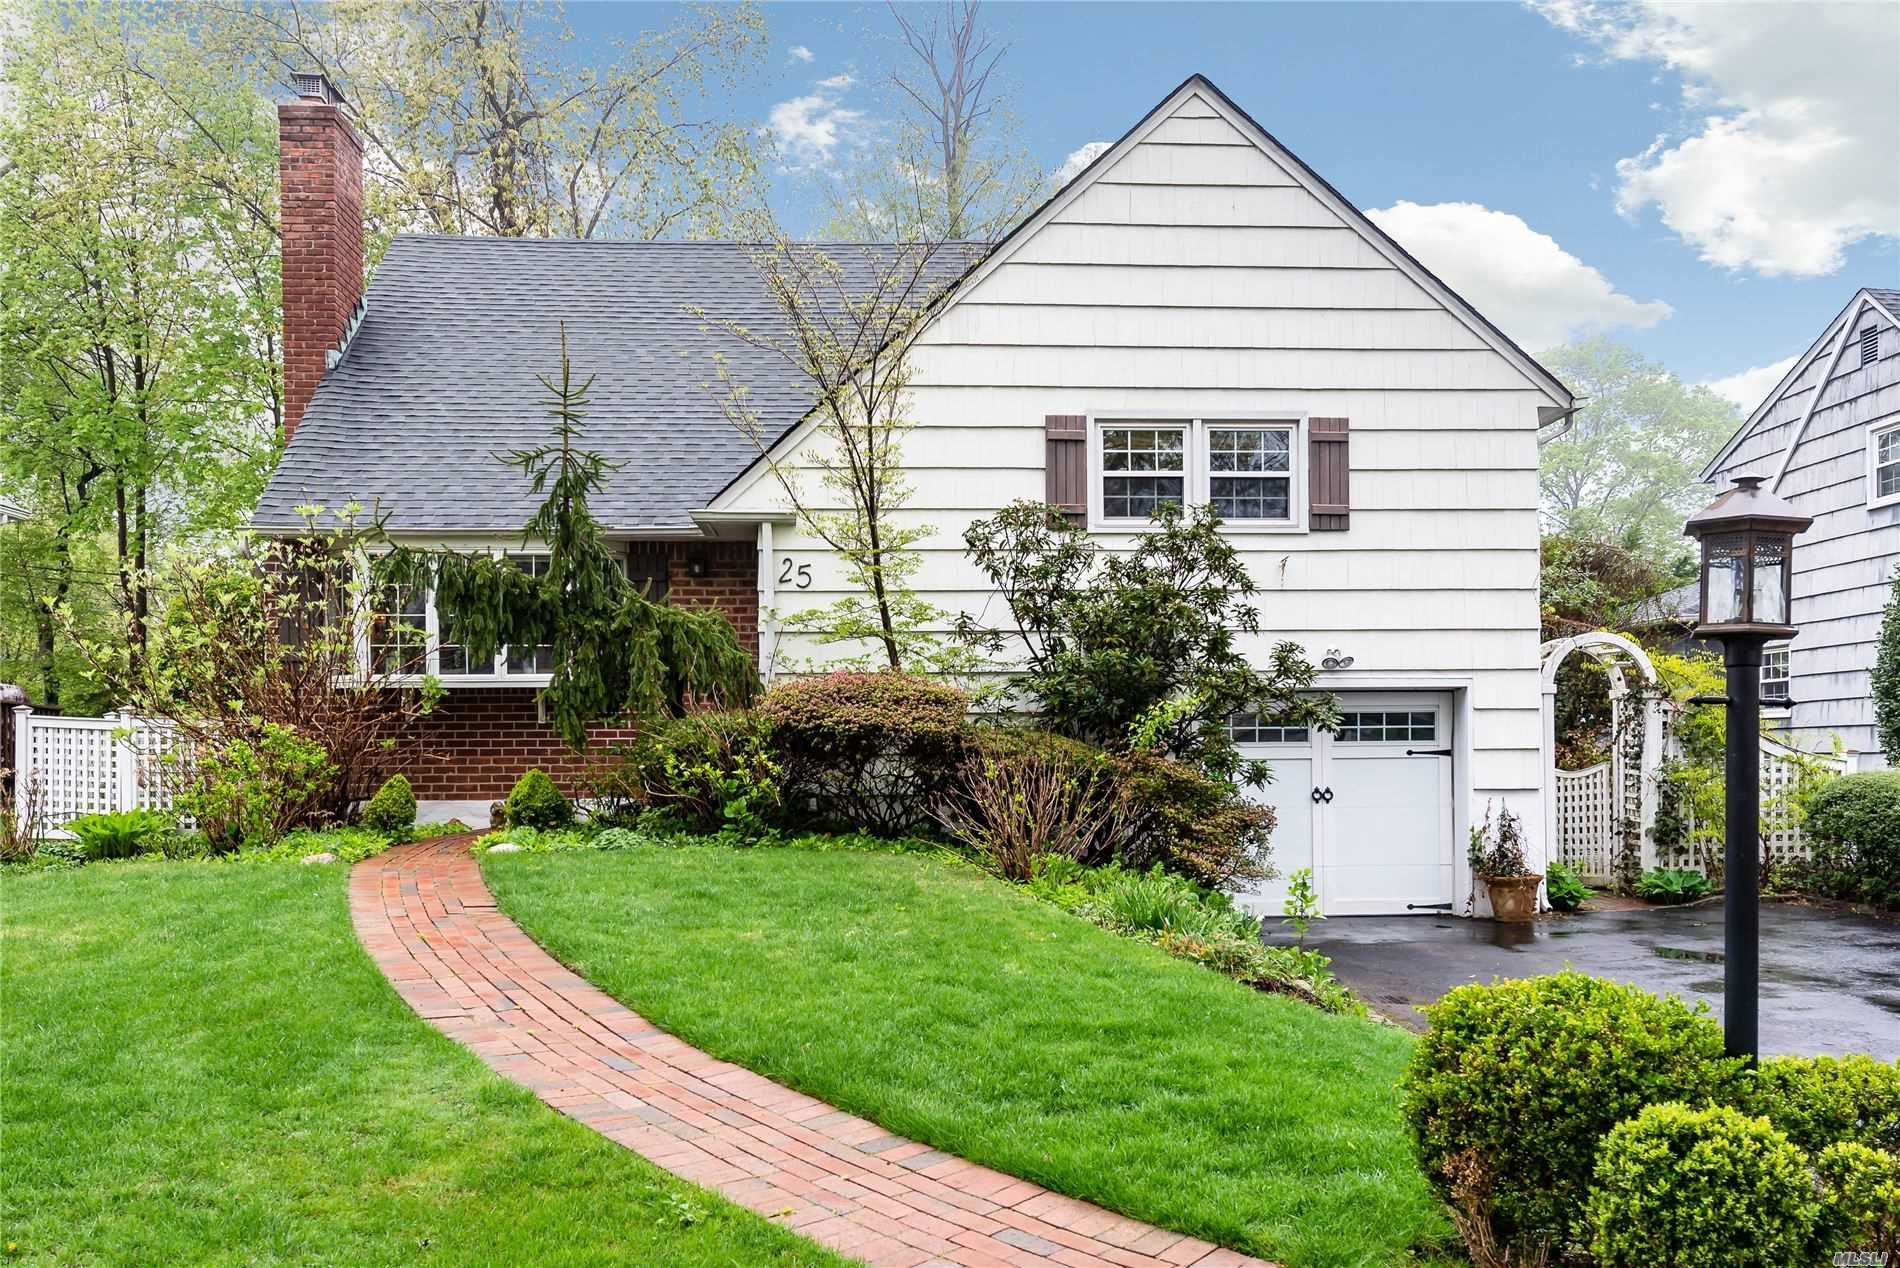 25 Salem Lane, Port Washington, NY 11050 - MLS#: 3213652